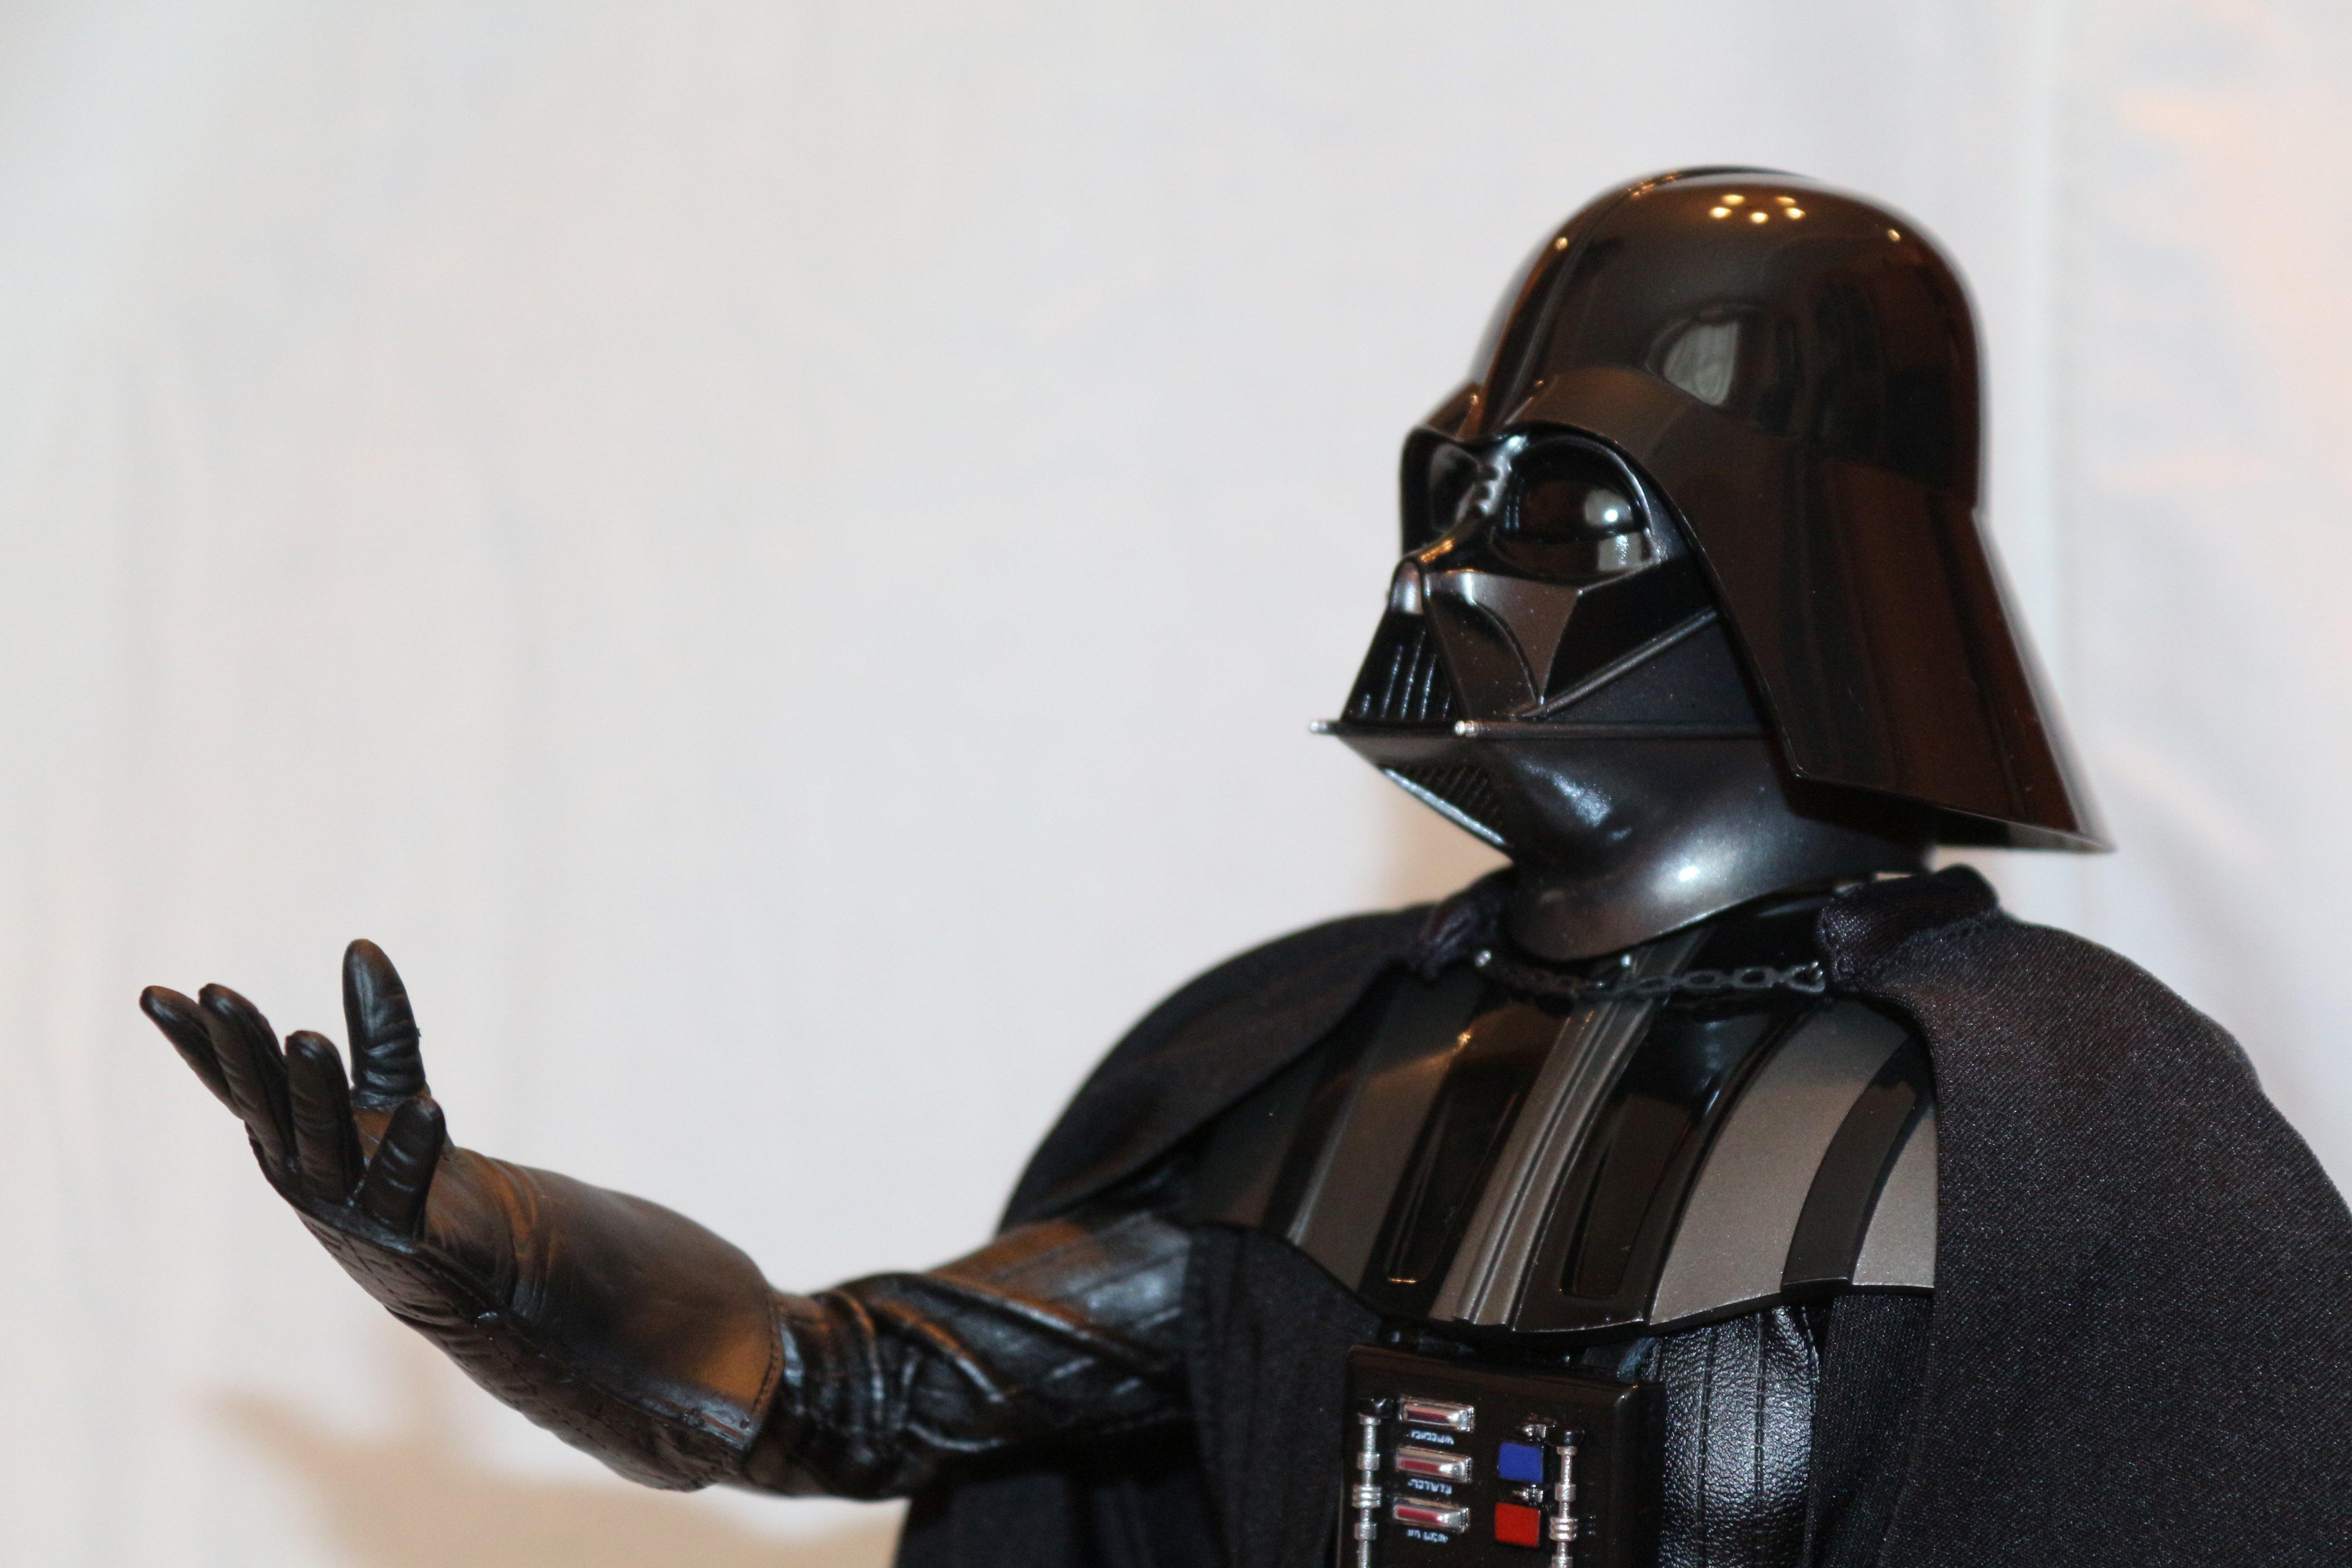 Sideshow Star Wars Deluxe Darth Vader 1/6 Scale Figure. Фотообзор - Изображение 28